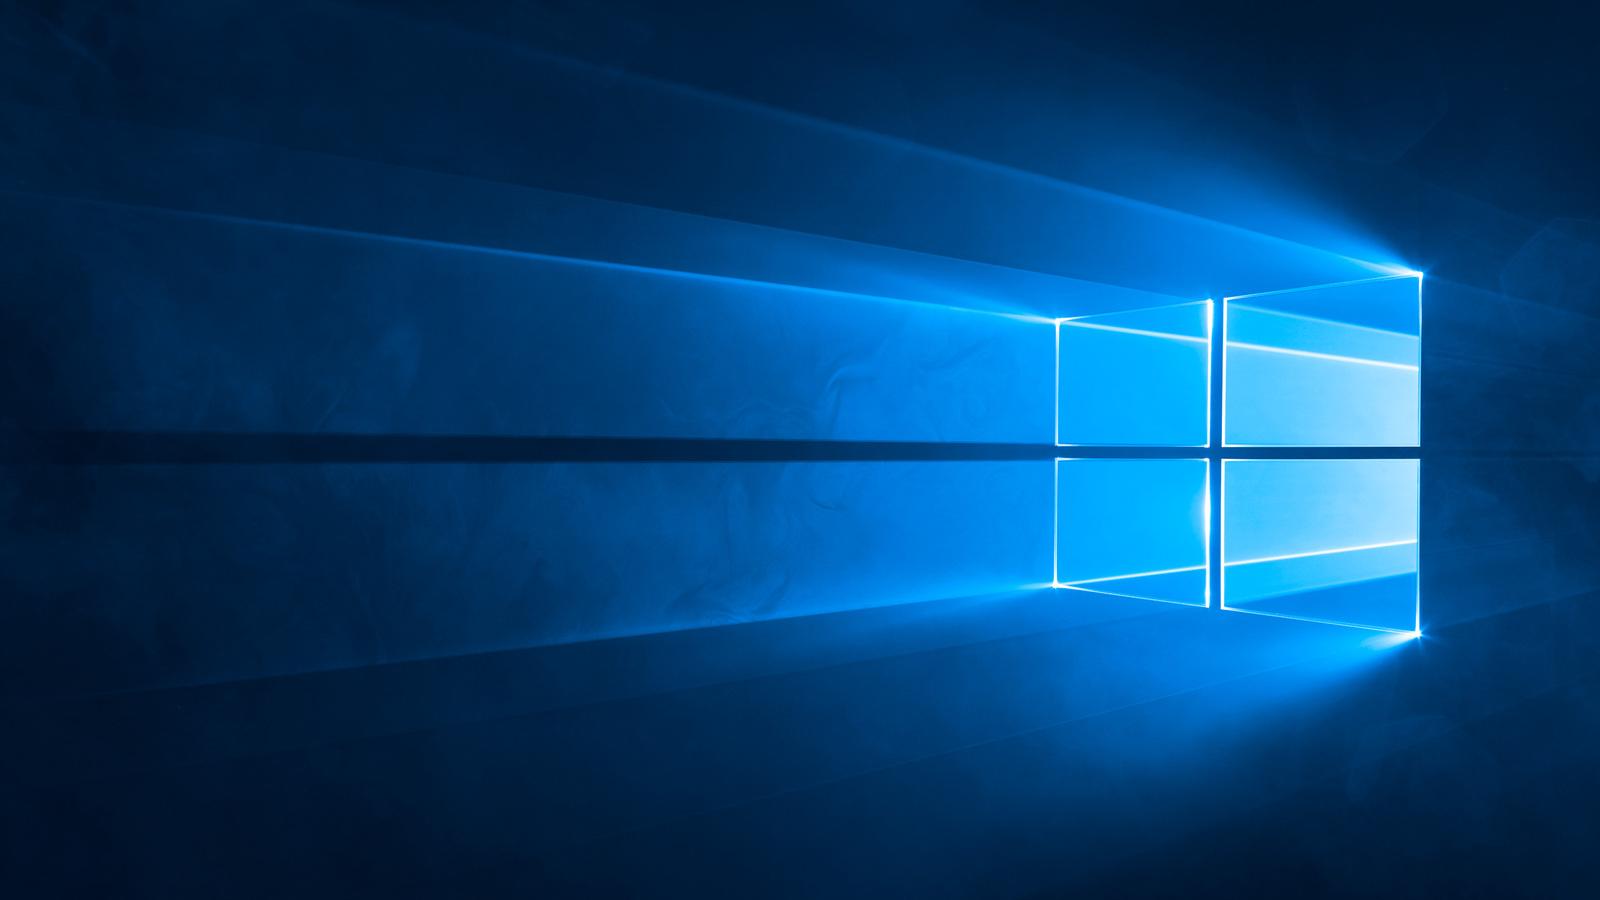 1600x900 windows 10 original 1600x900 resolution hd 4k wallpapers